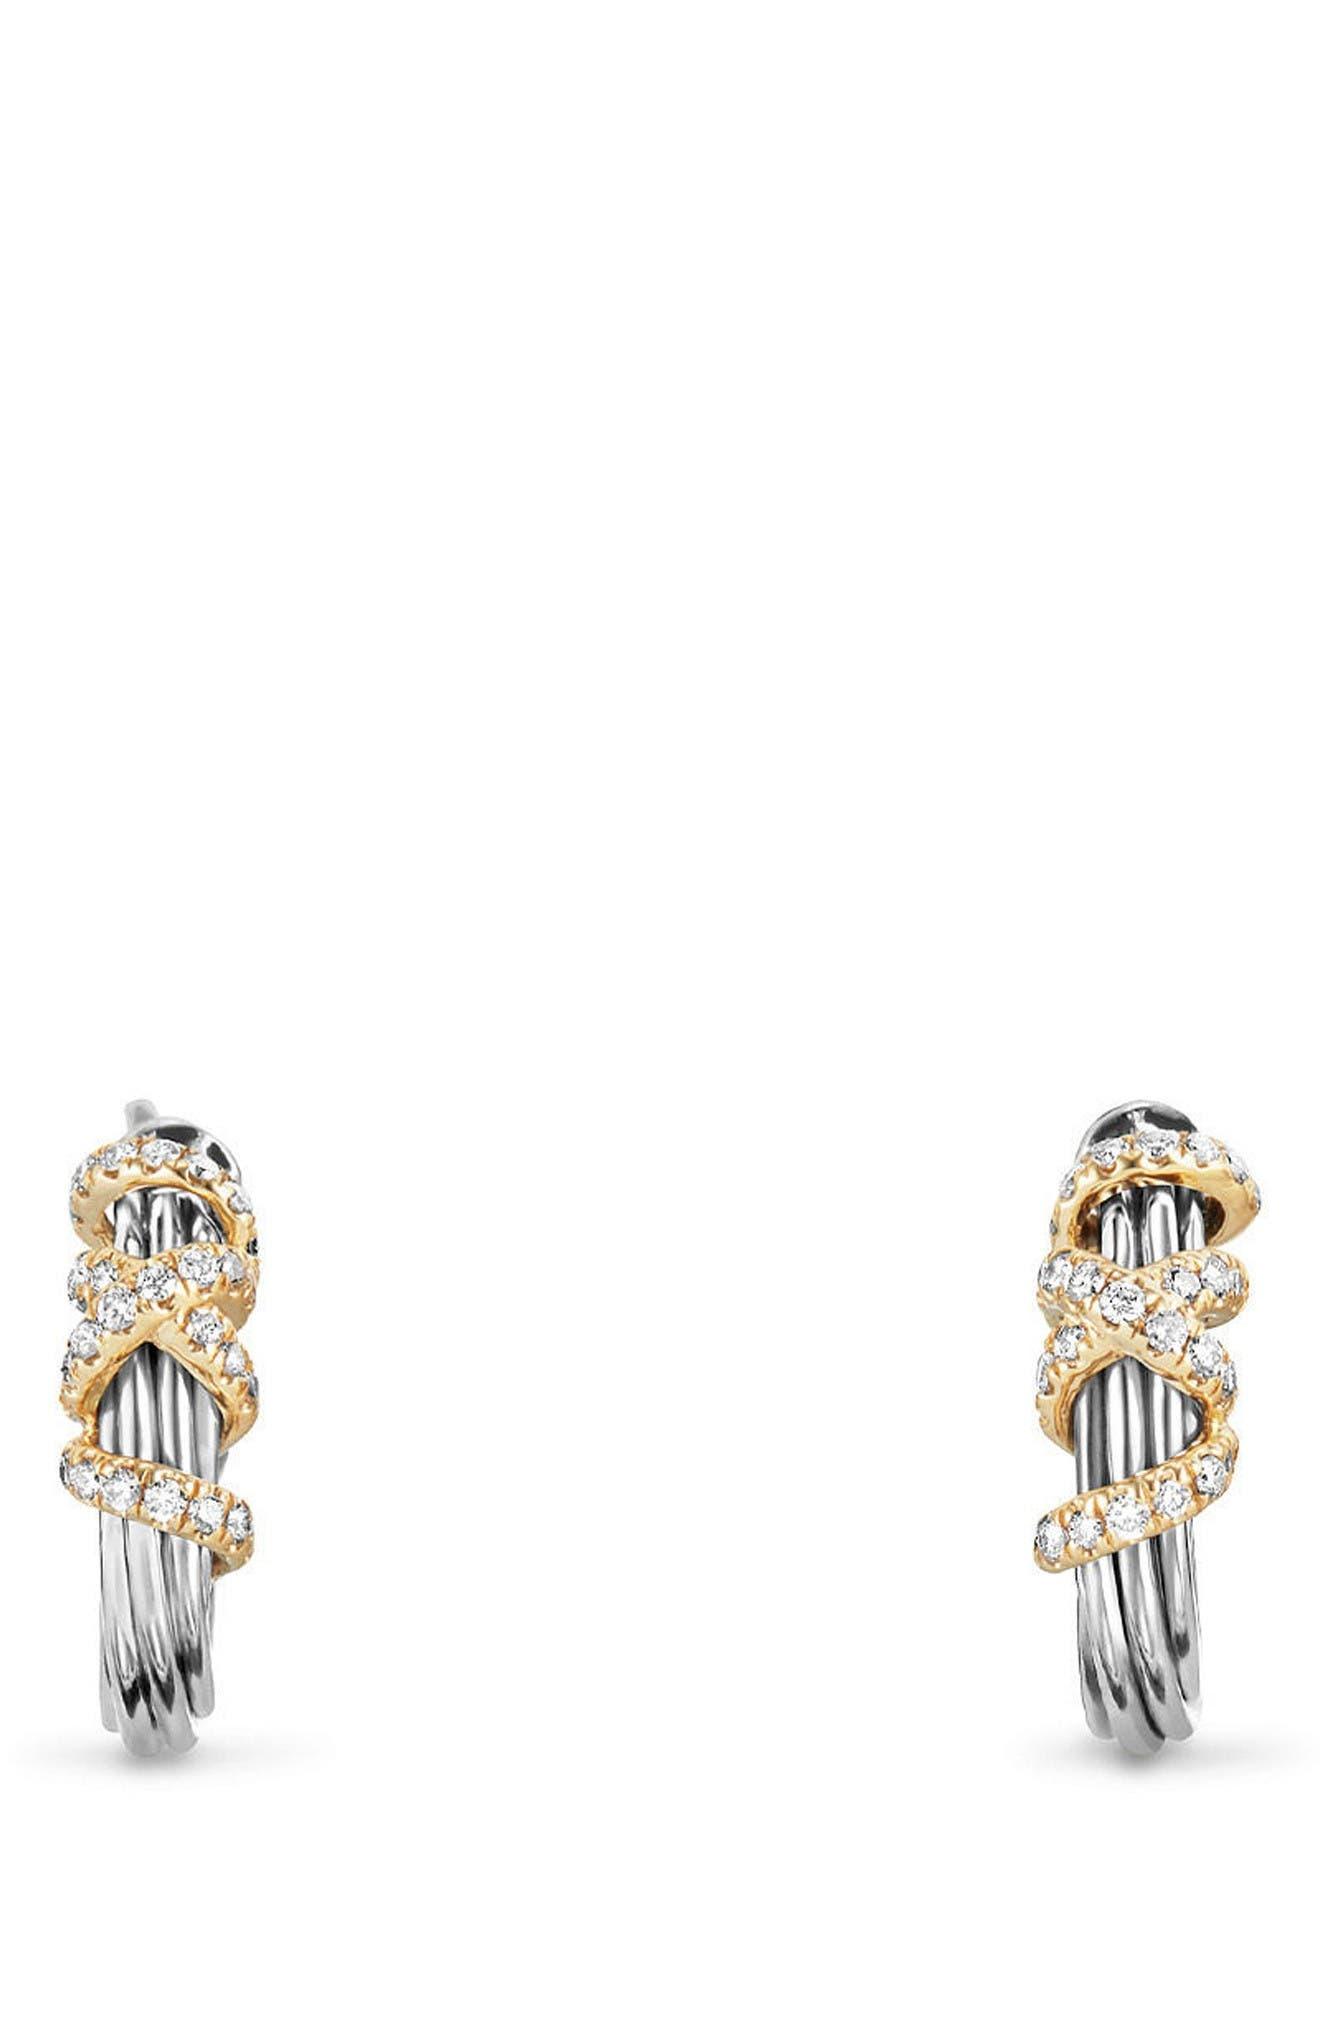 DAVID YURMAN Helena Small Hoop Earrings with Diamonds & 18K Gold